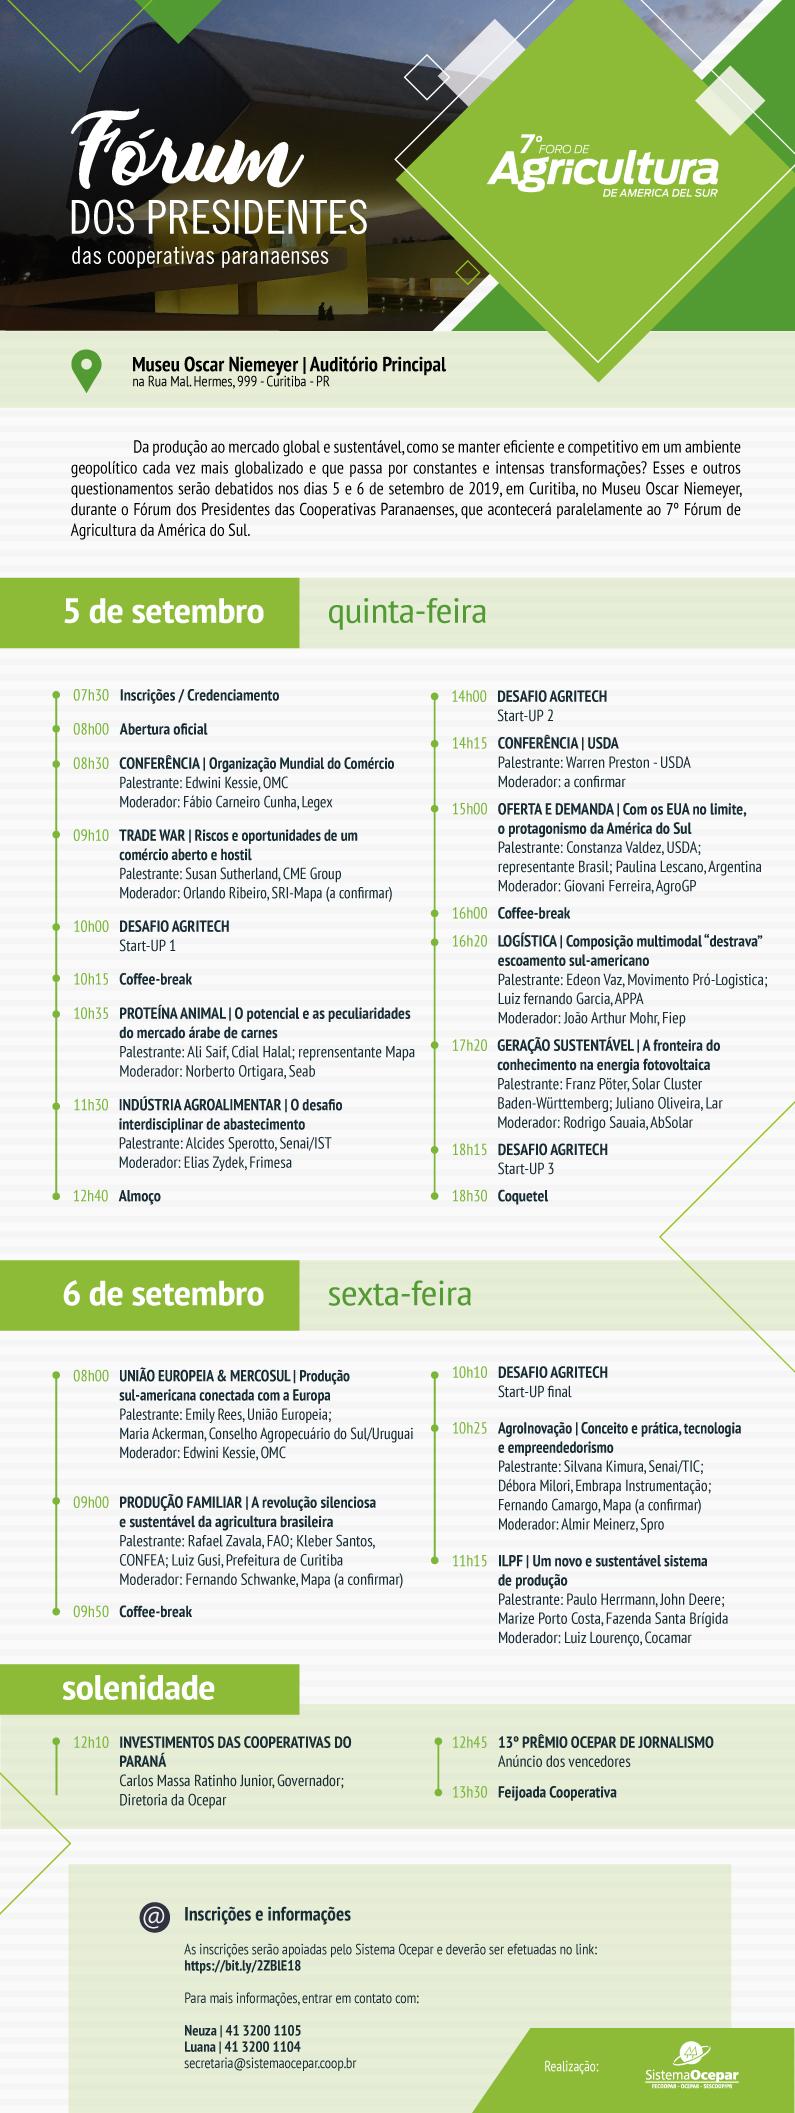 forum presidentes folder 30 08 2019